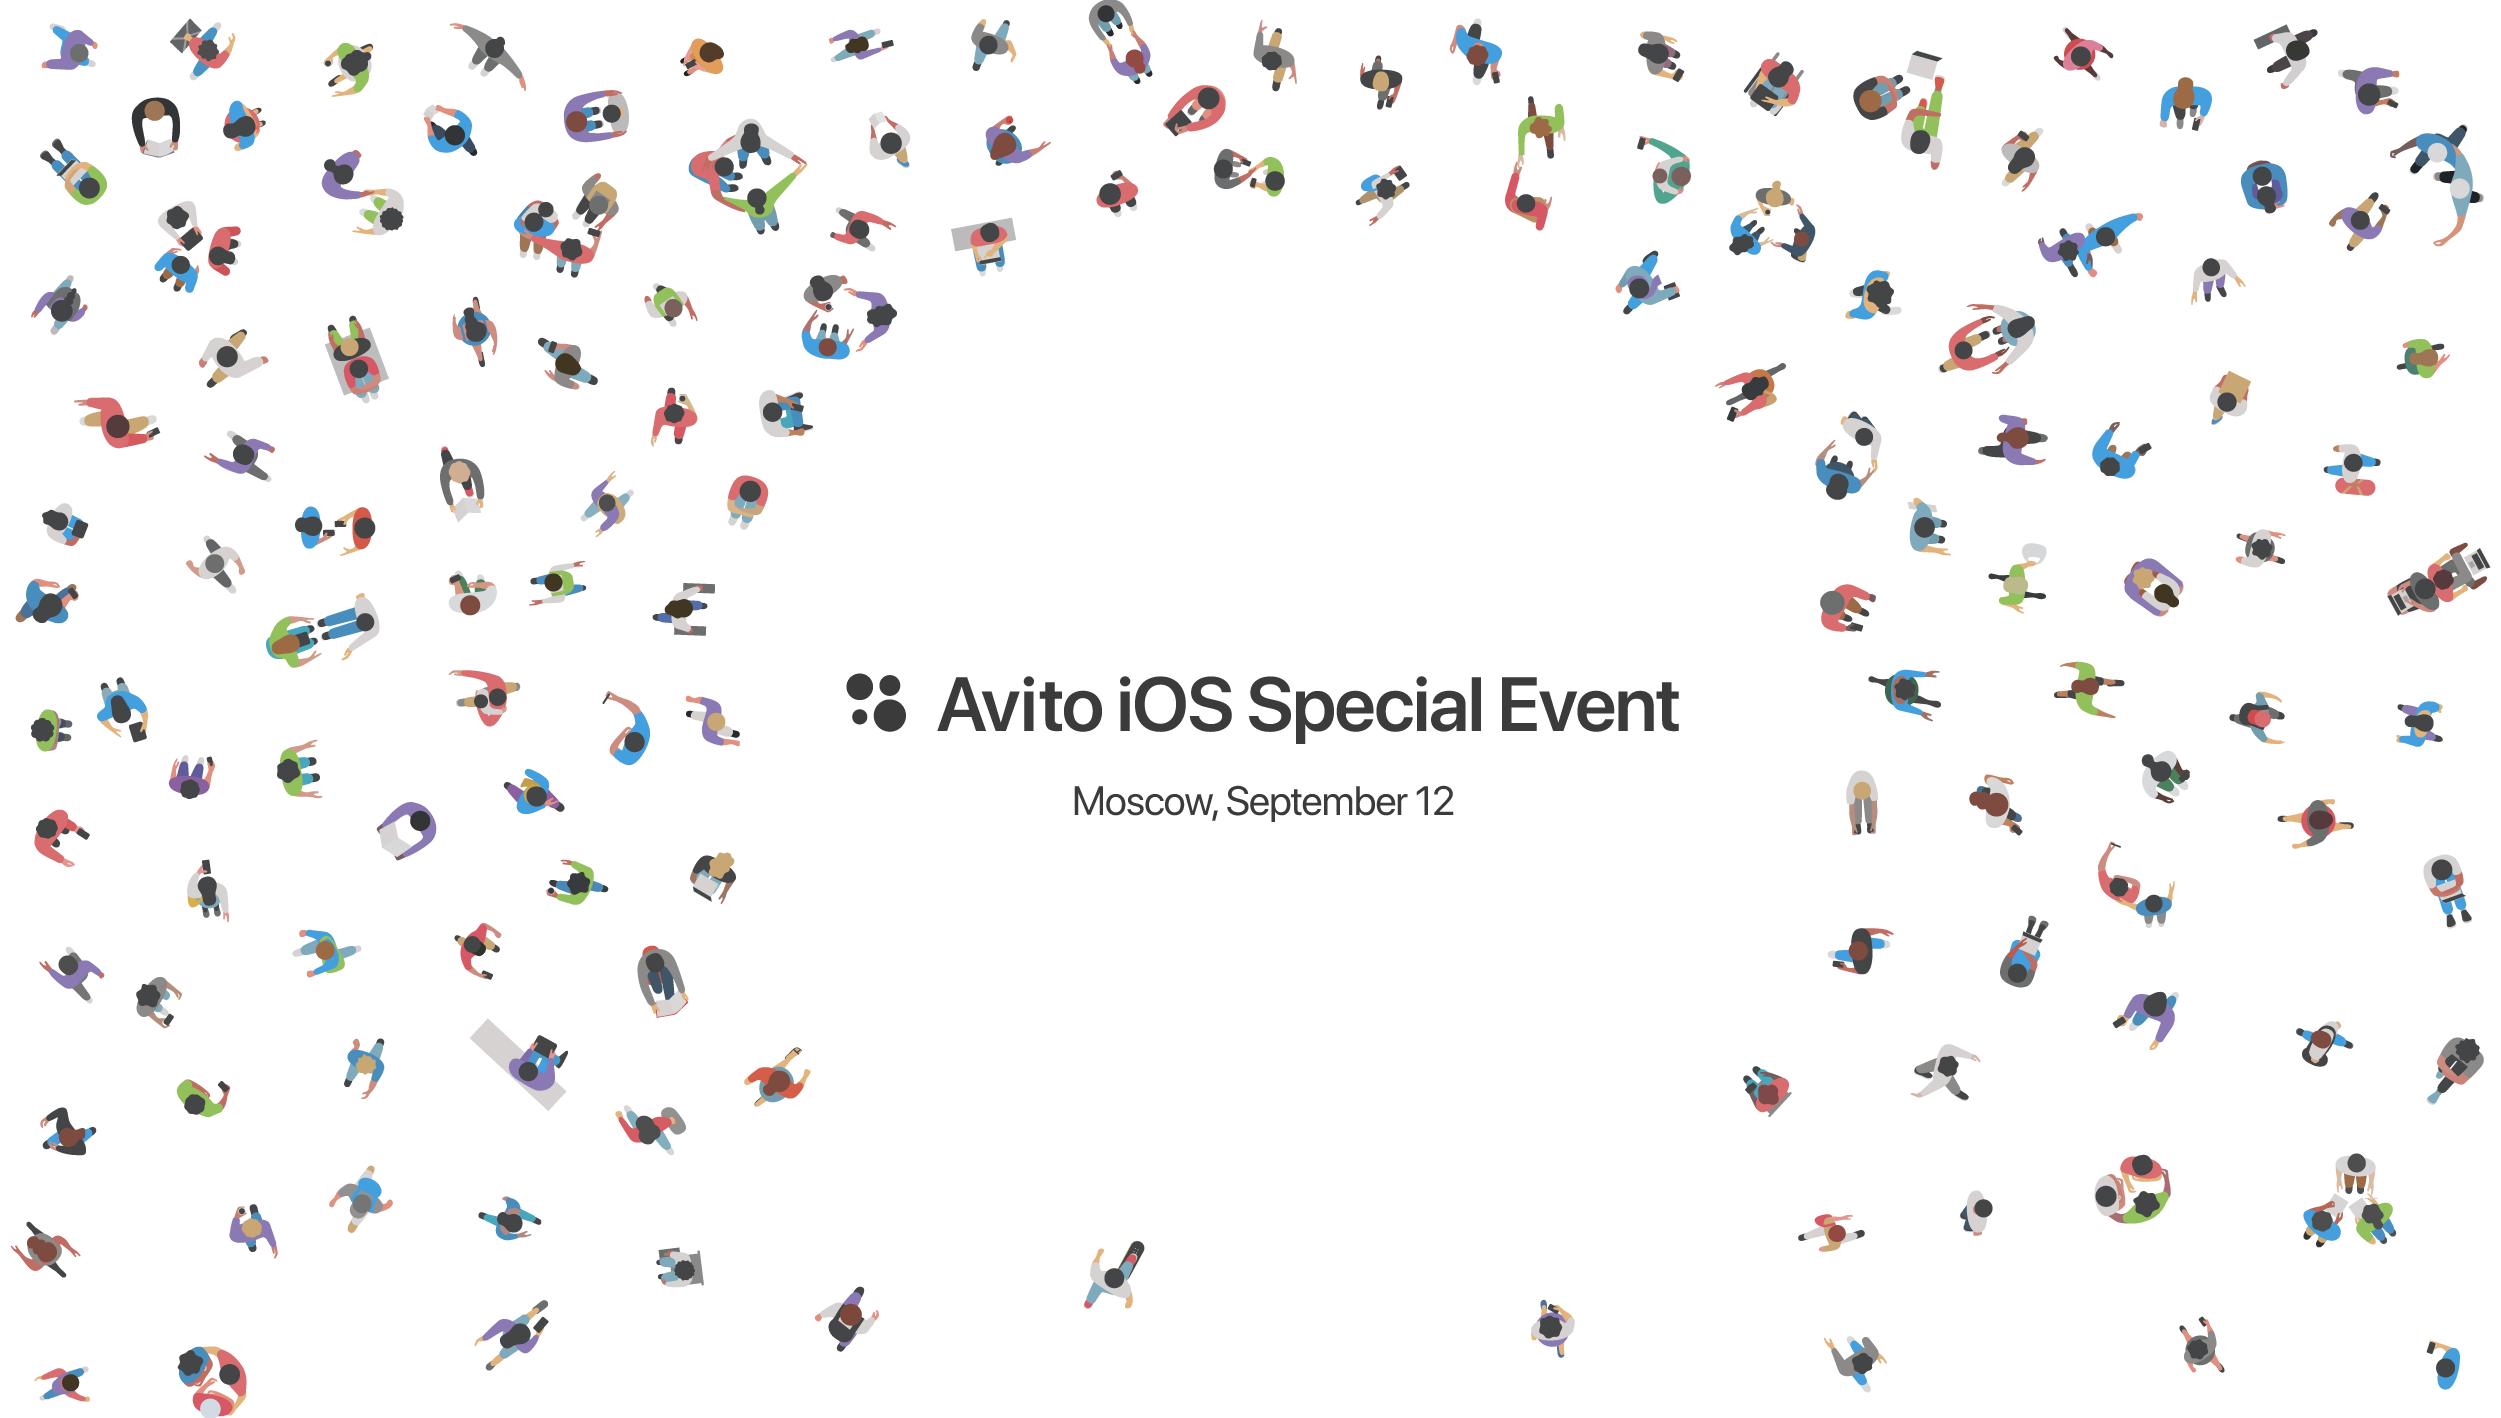 Avito Special iOS Event